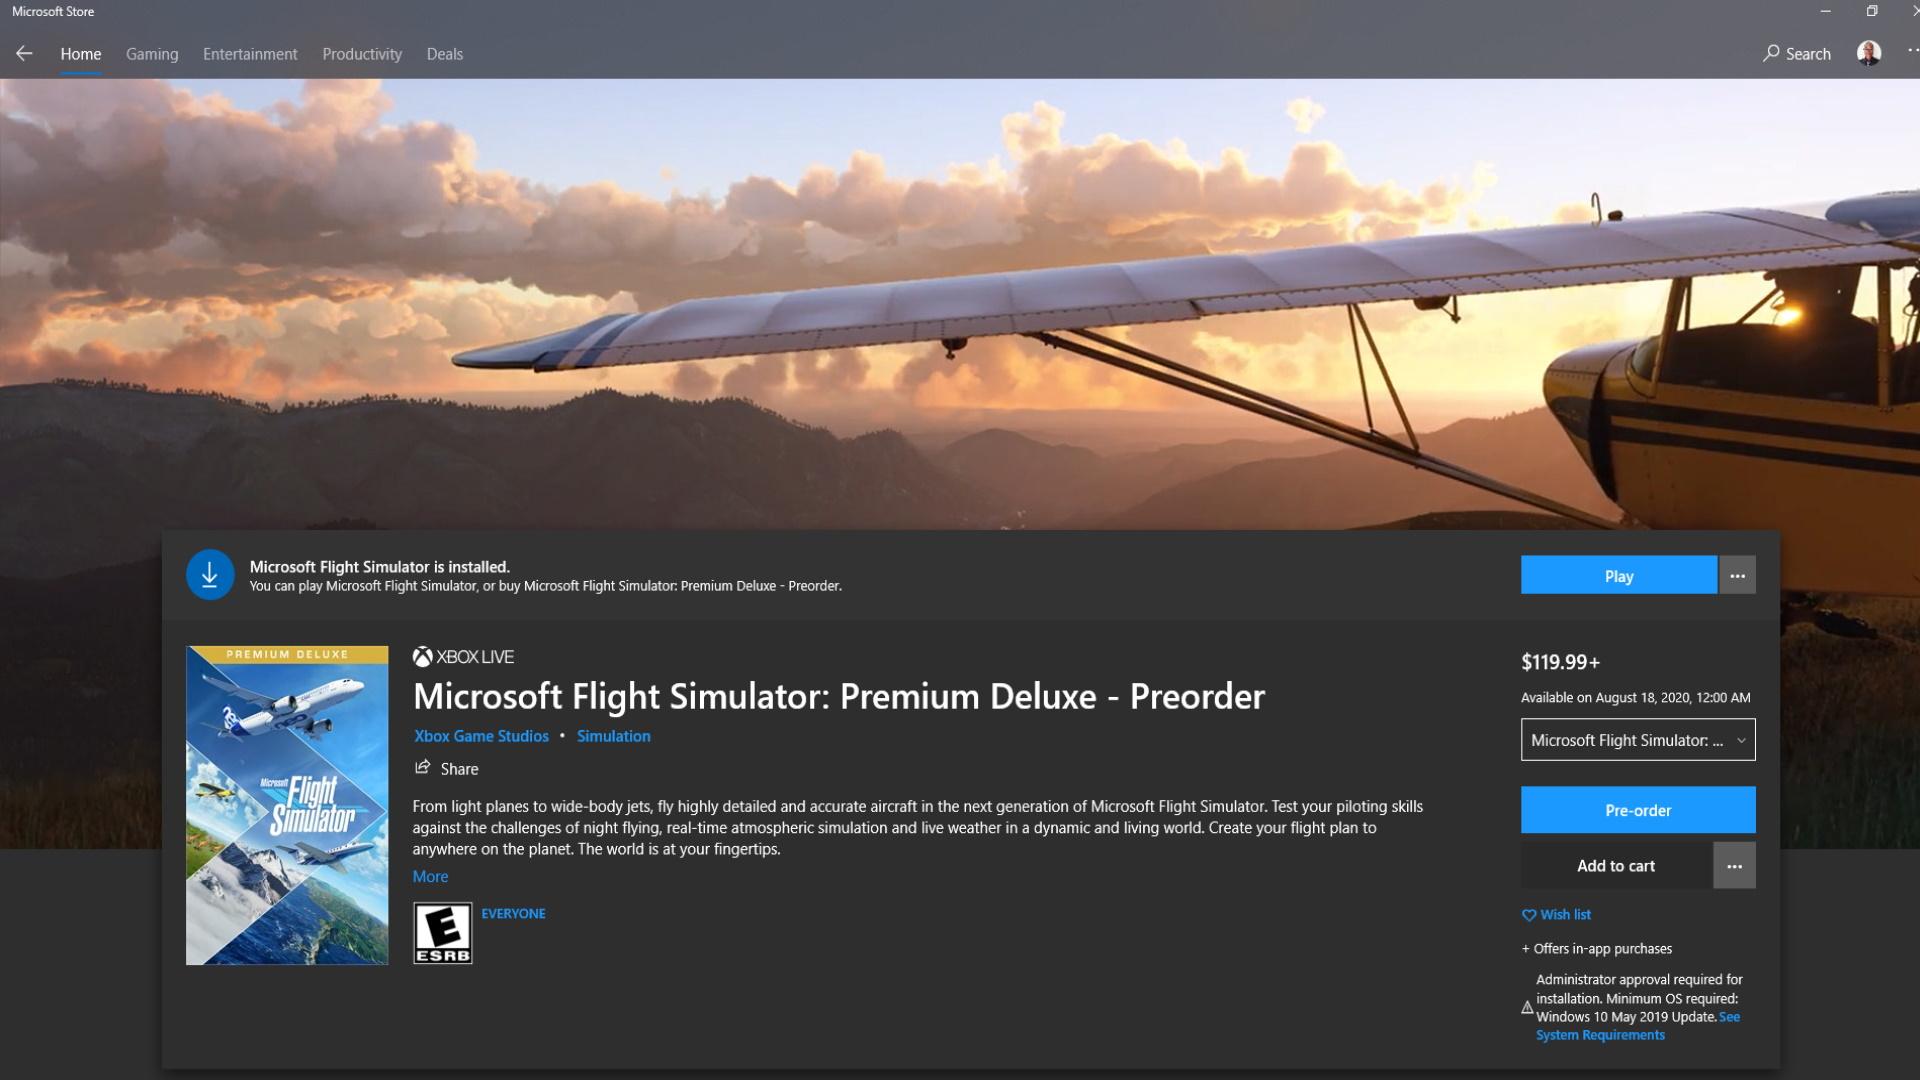 Microsoft Flight Simulator Windoes Store Page